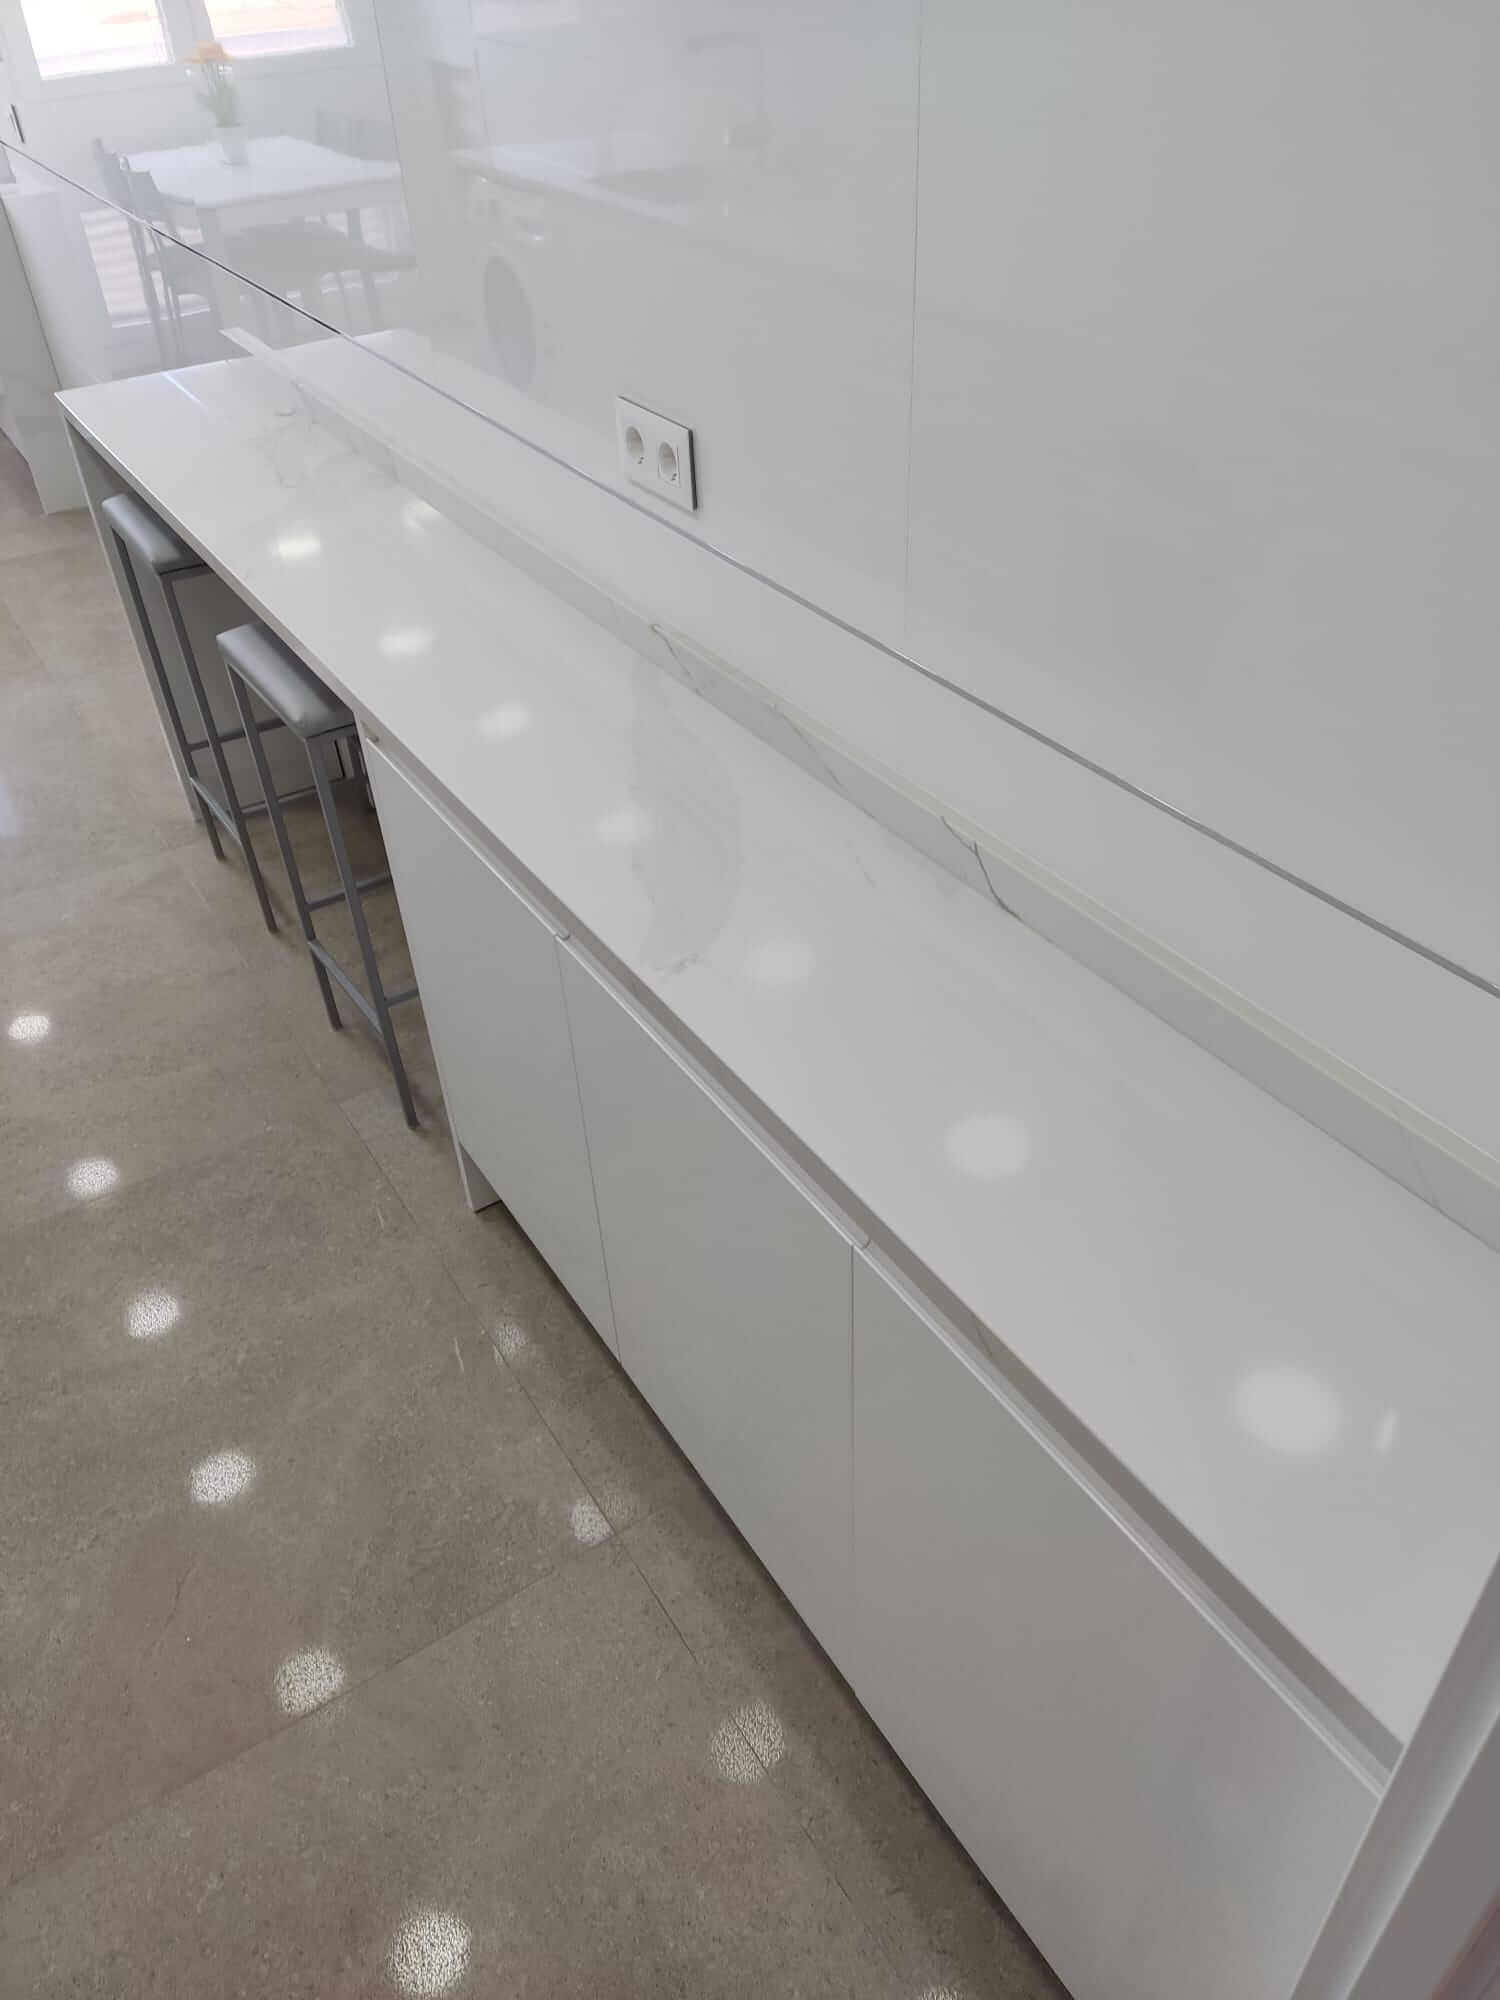 reformas-pisos-majadahonda-junio-2021 (4)